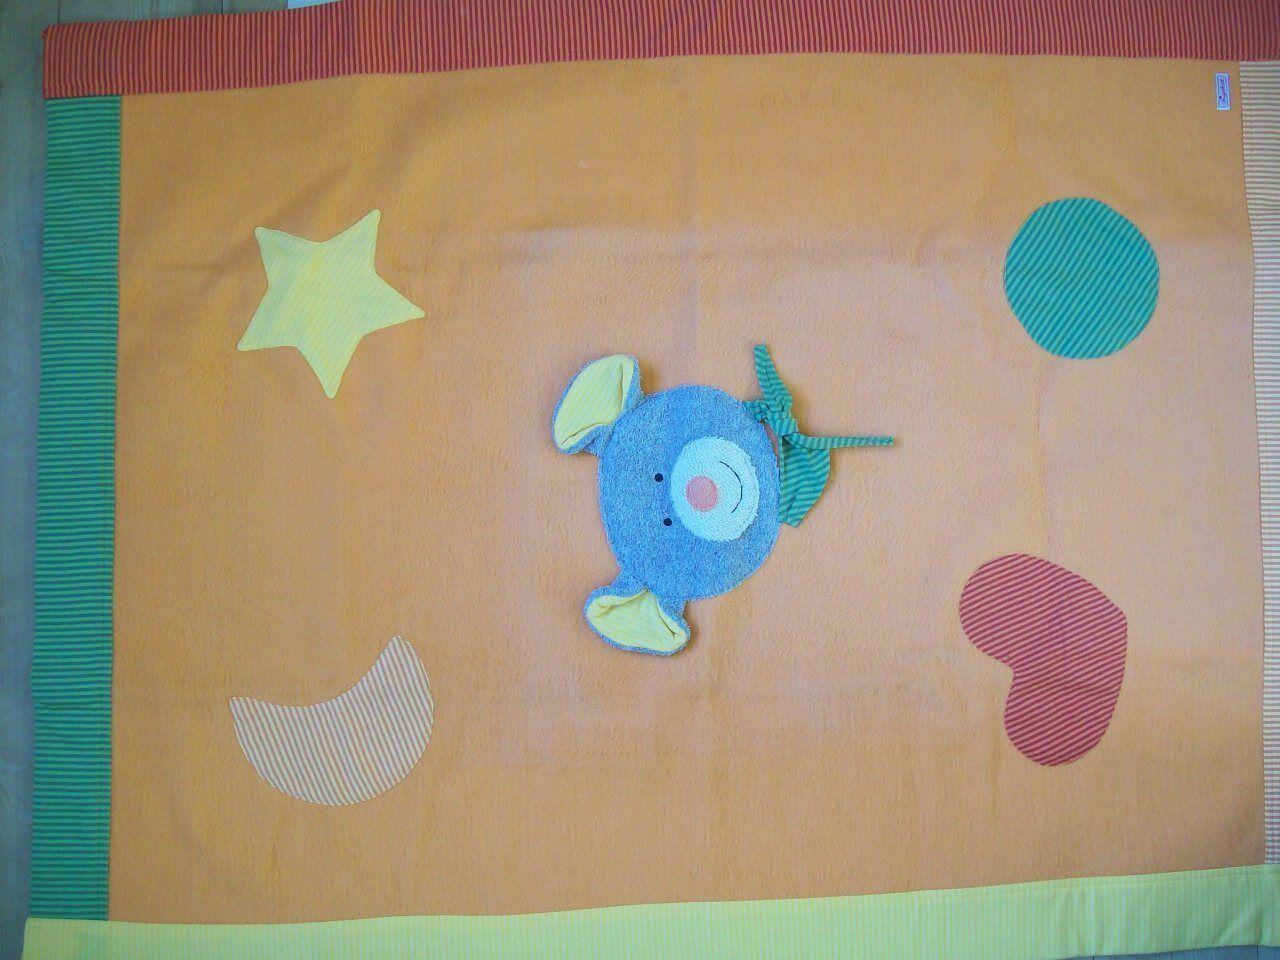 Sigikid Decke Merry Mus 100 x 75 75 75 cm Ausstellungsstück verfärbt Kinderdecke de05b8